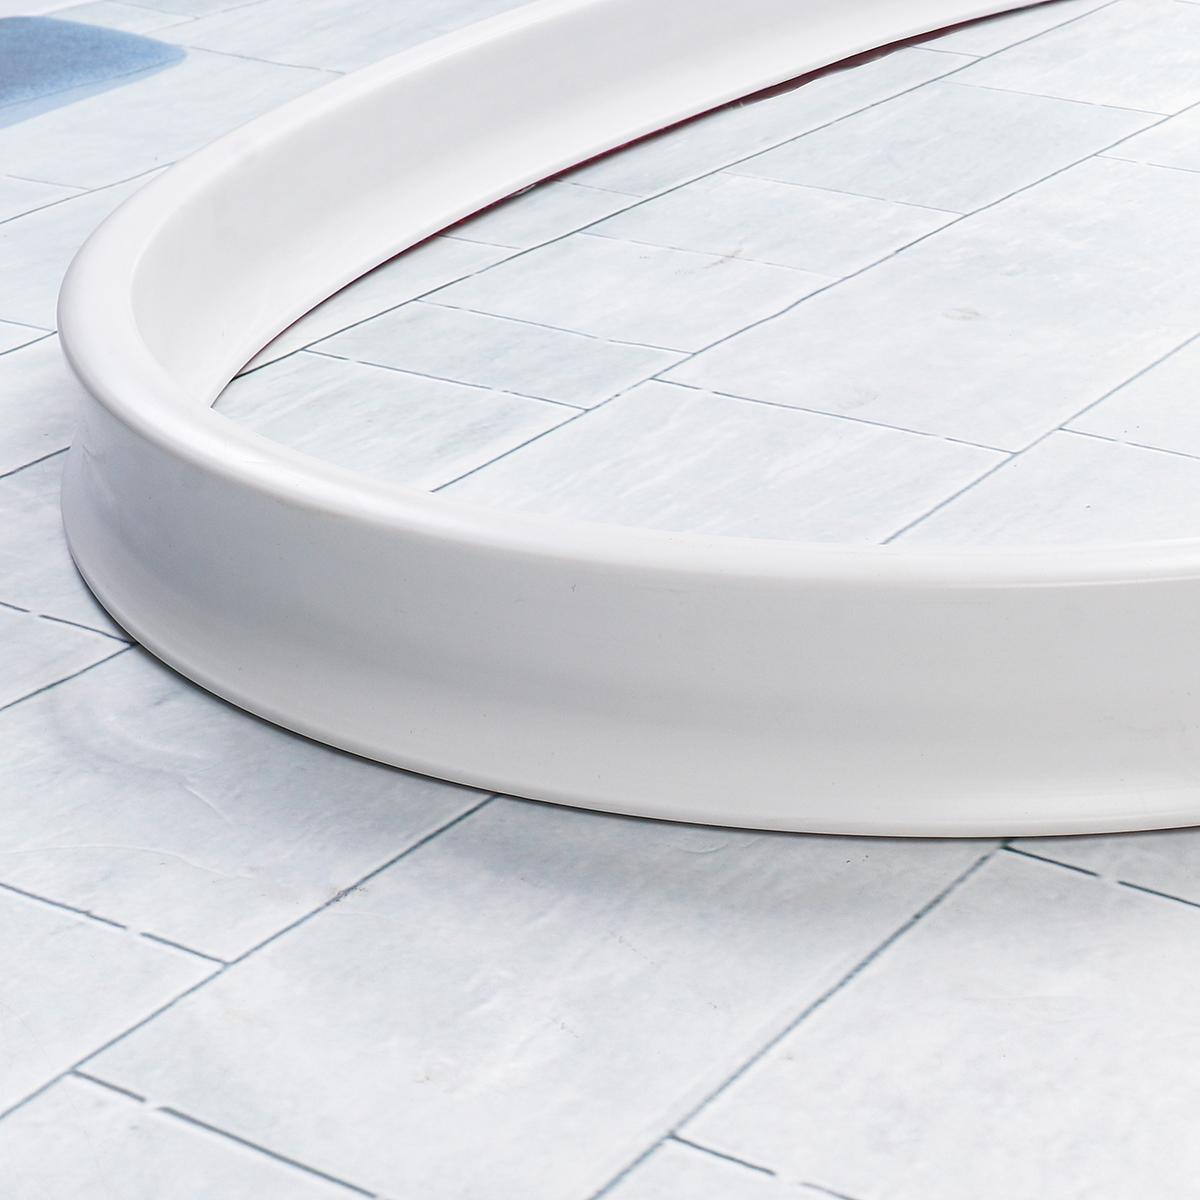 0.5M~1.5M White Flexible Water Retaining Strip Threshold Dam PVC Shower